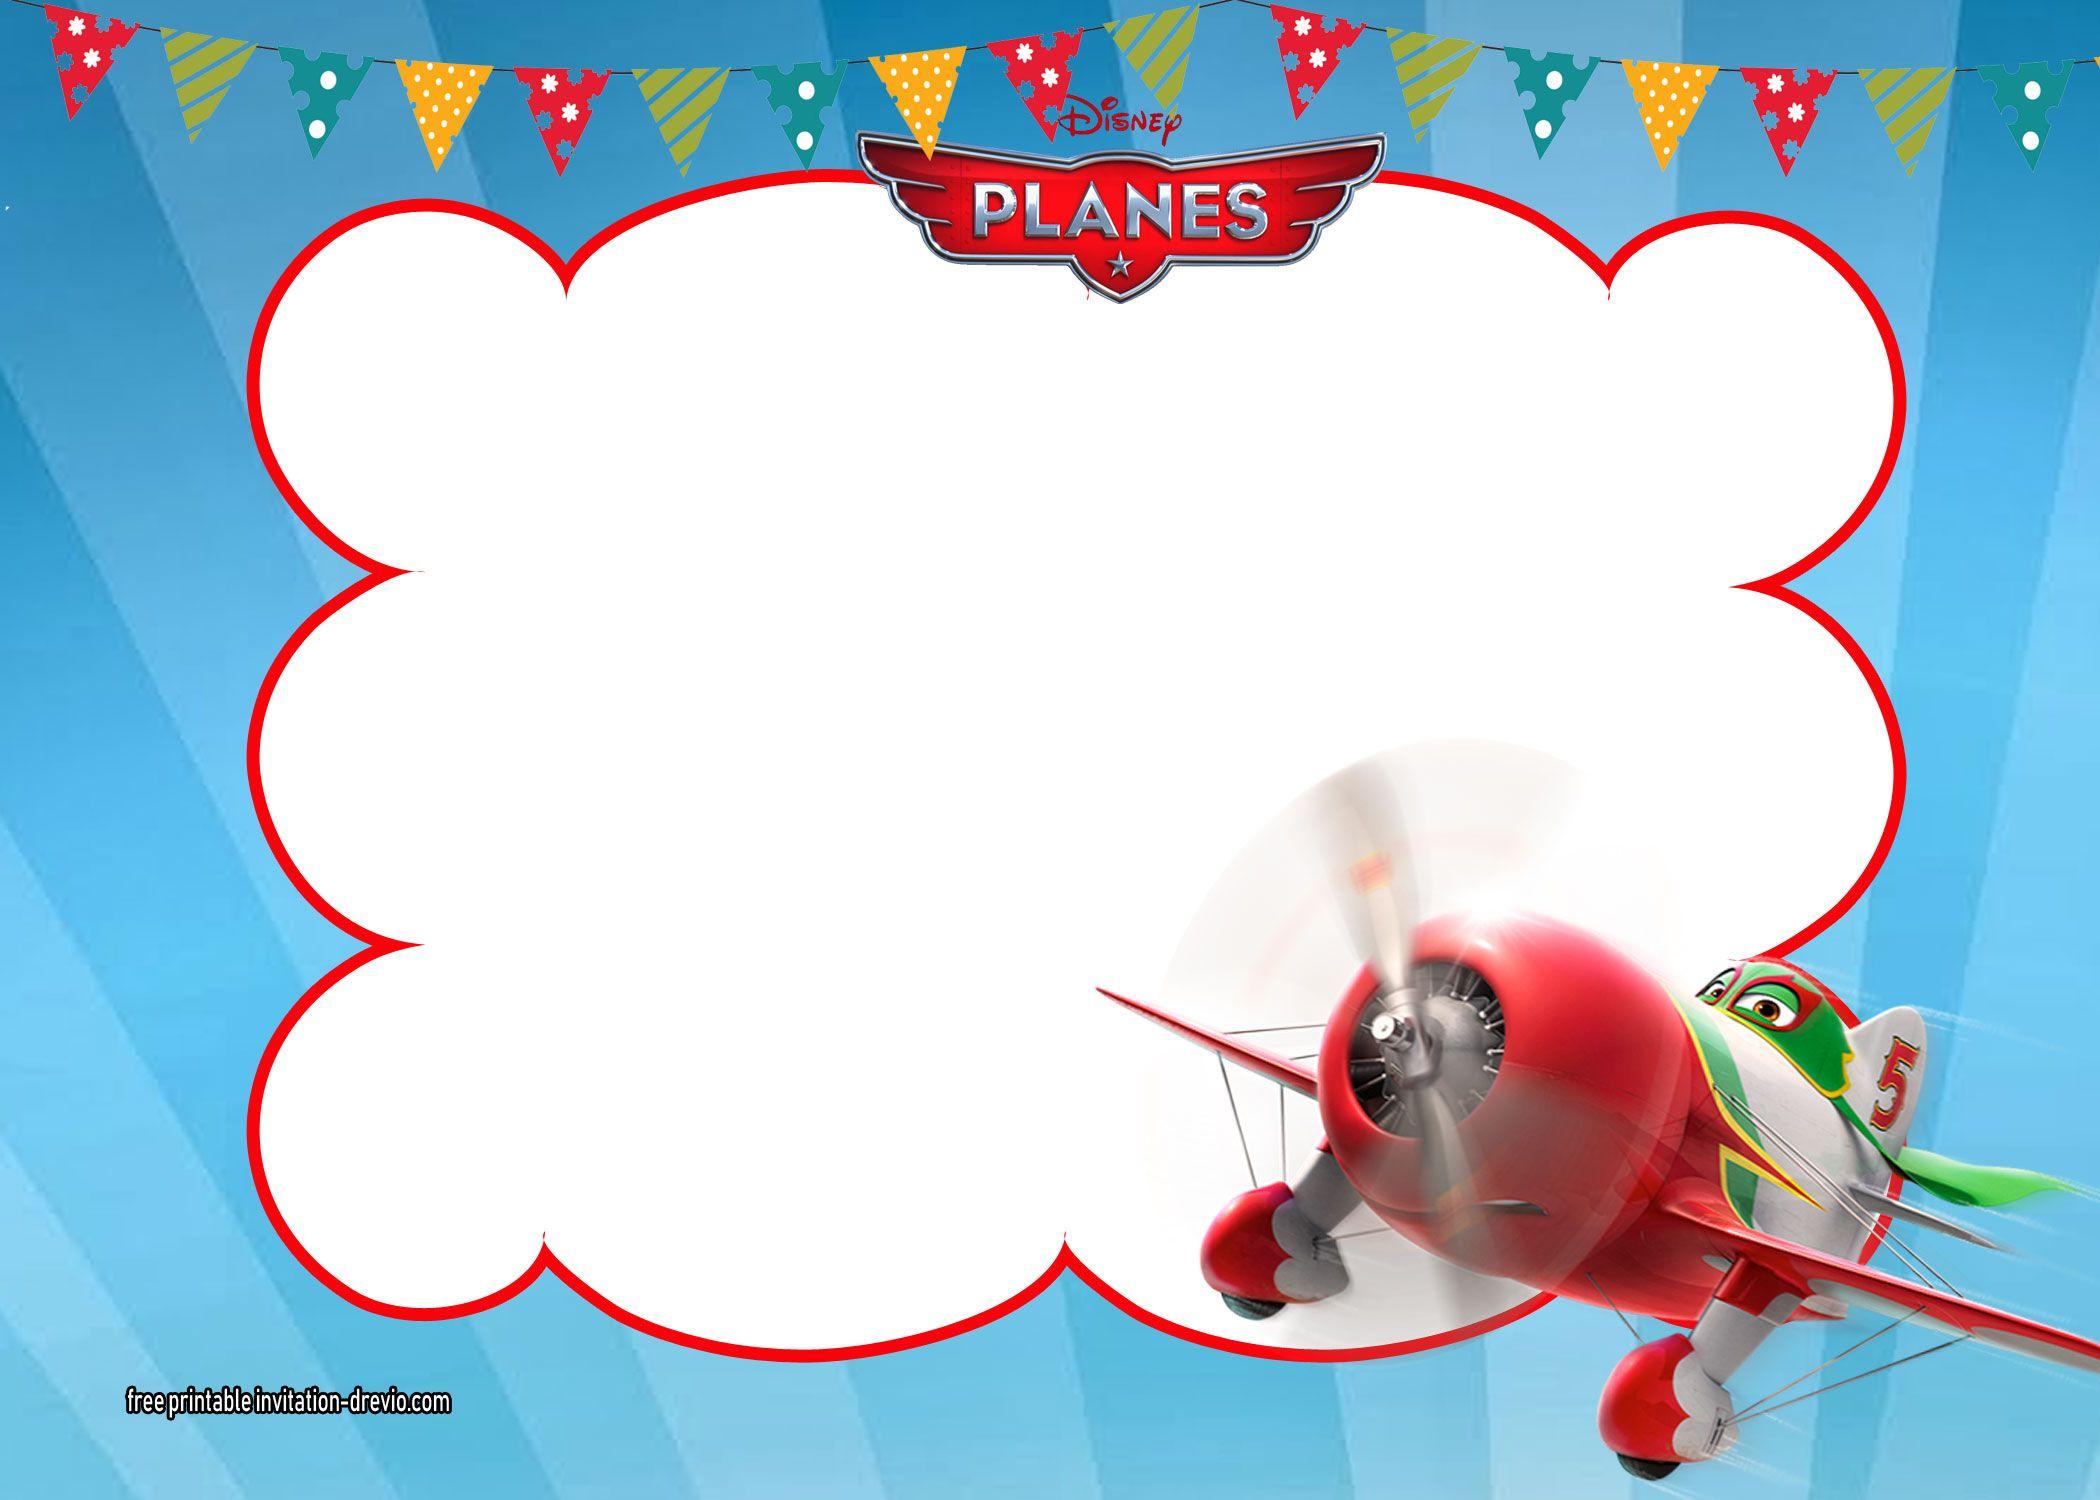 Disney Planes Invitations Templates Planes Birthday Disney Planes Birthday Free Birthday Printables